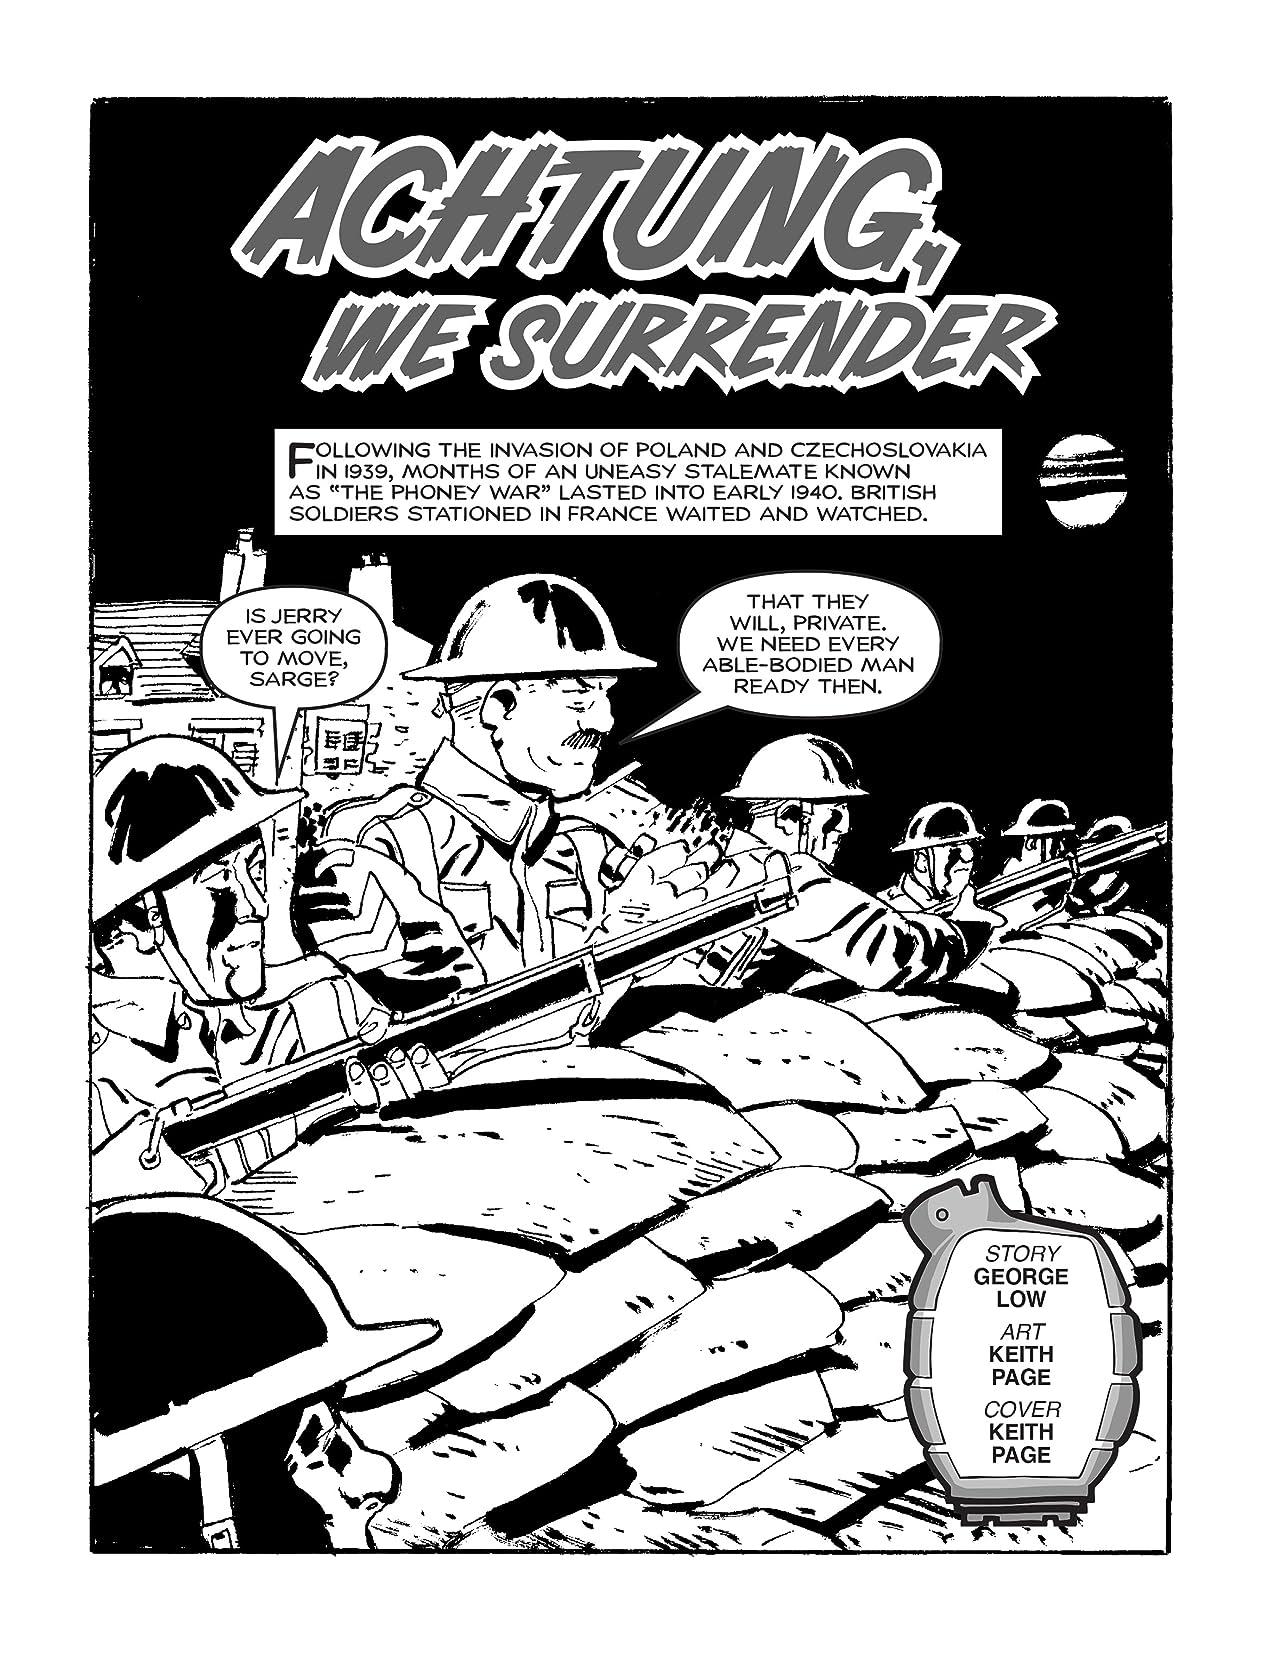 Commando #4991: Achtung, We Surrender